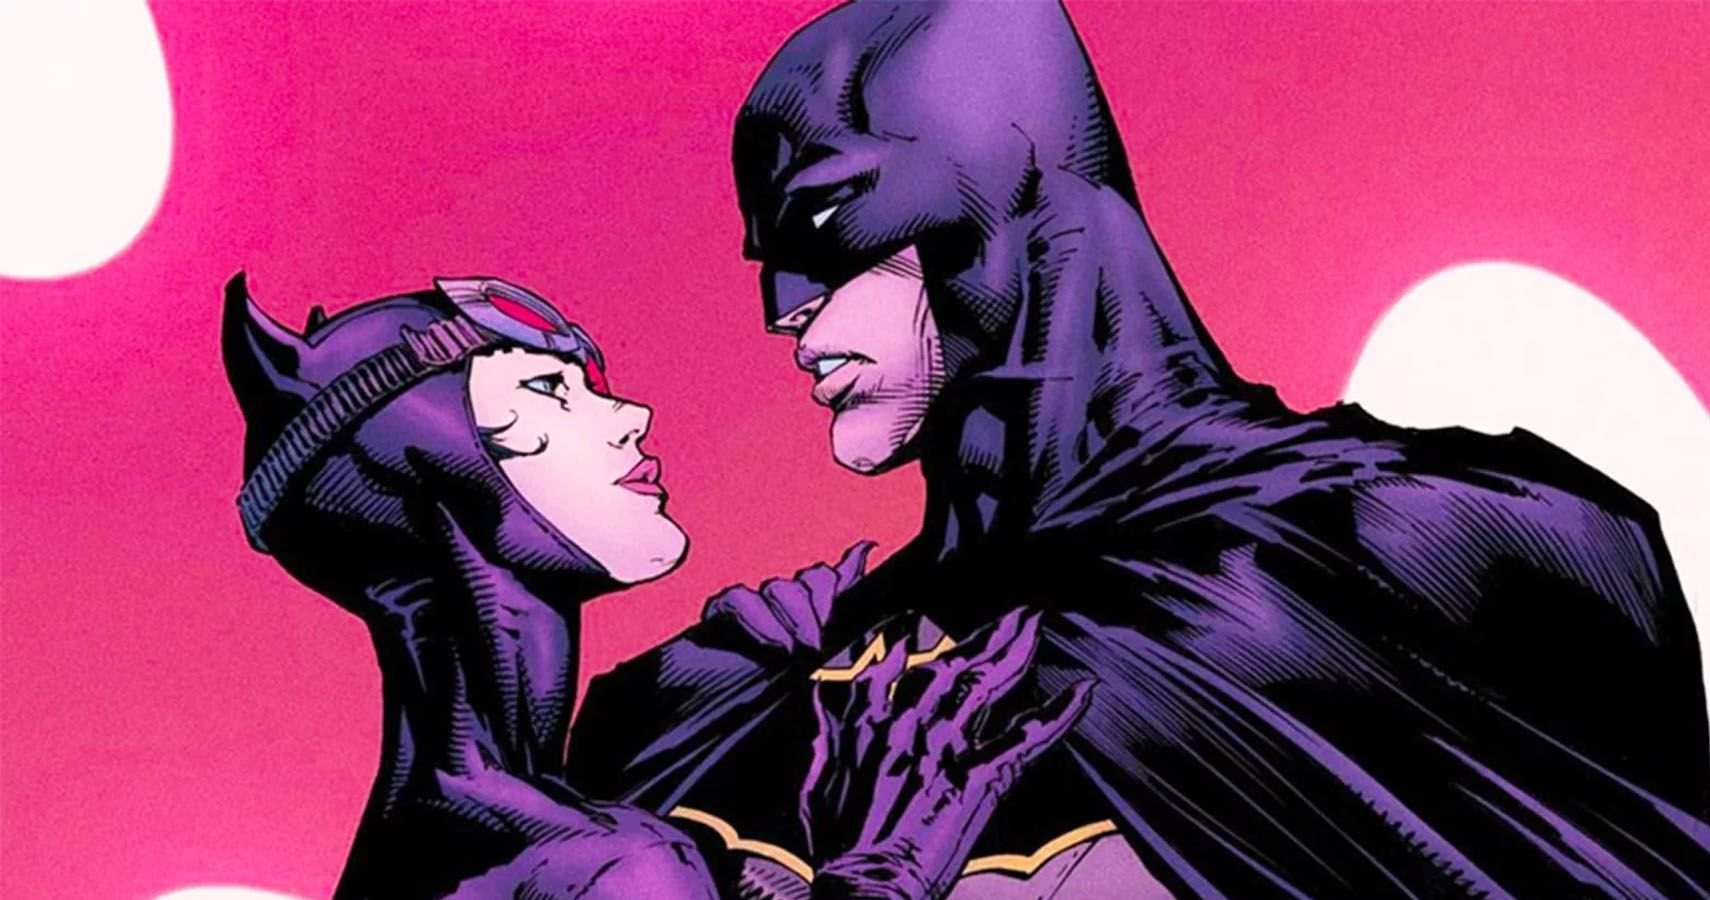 The Batman Director Matt Reeves Welcomes Zoe Kravitz To the Cast